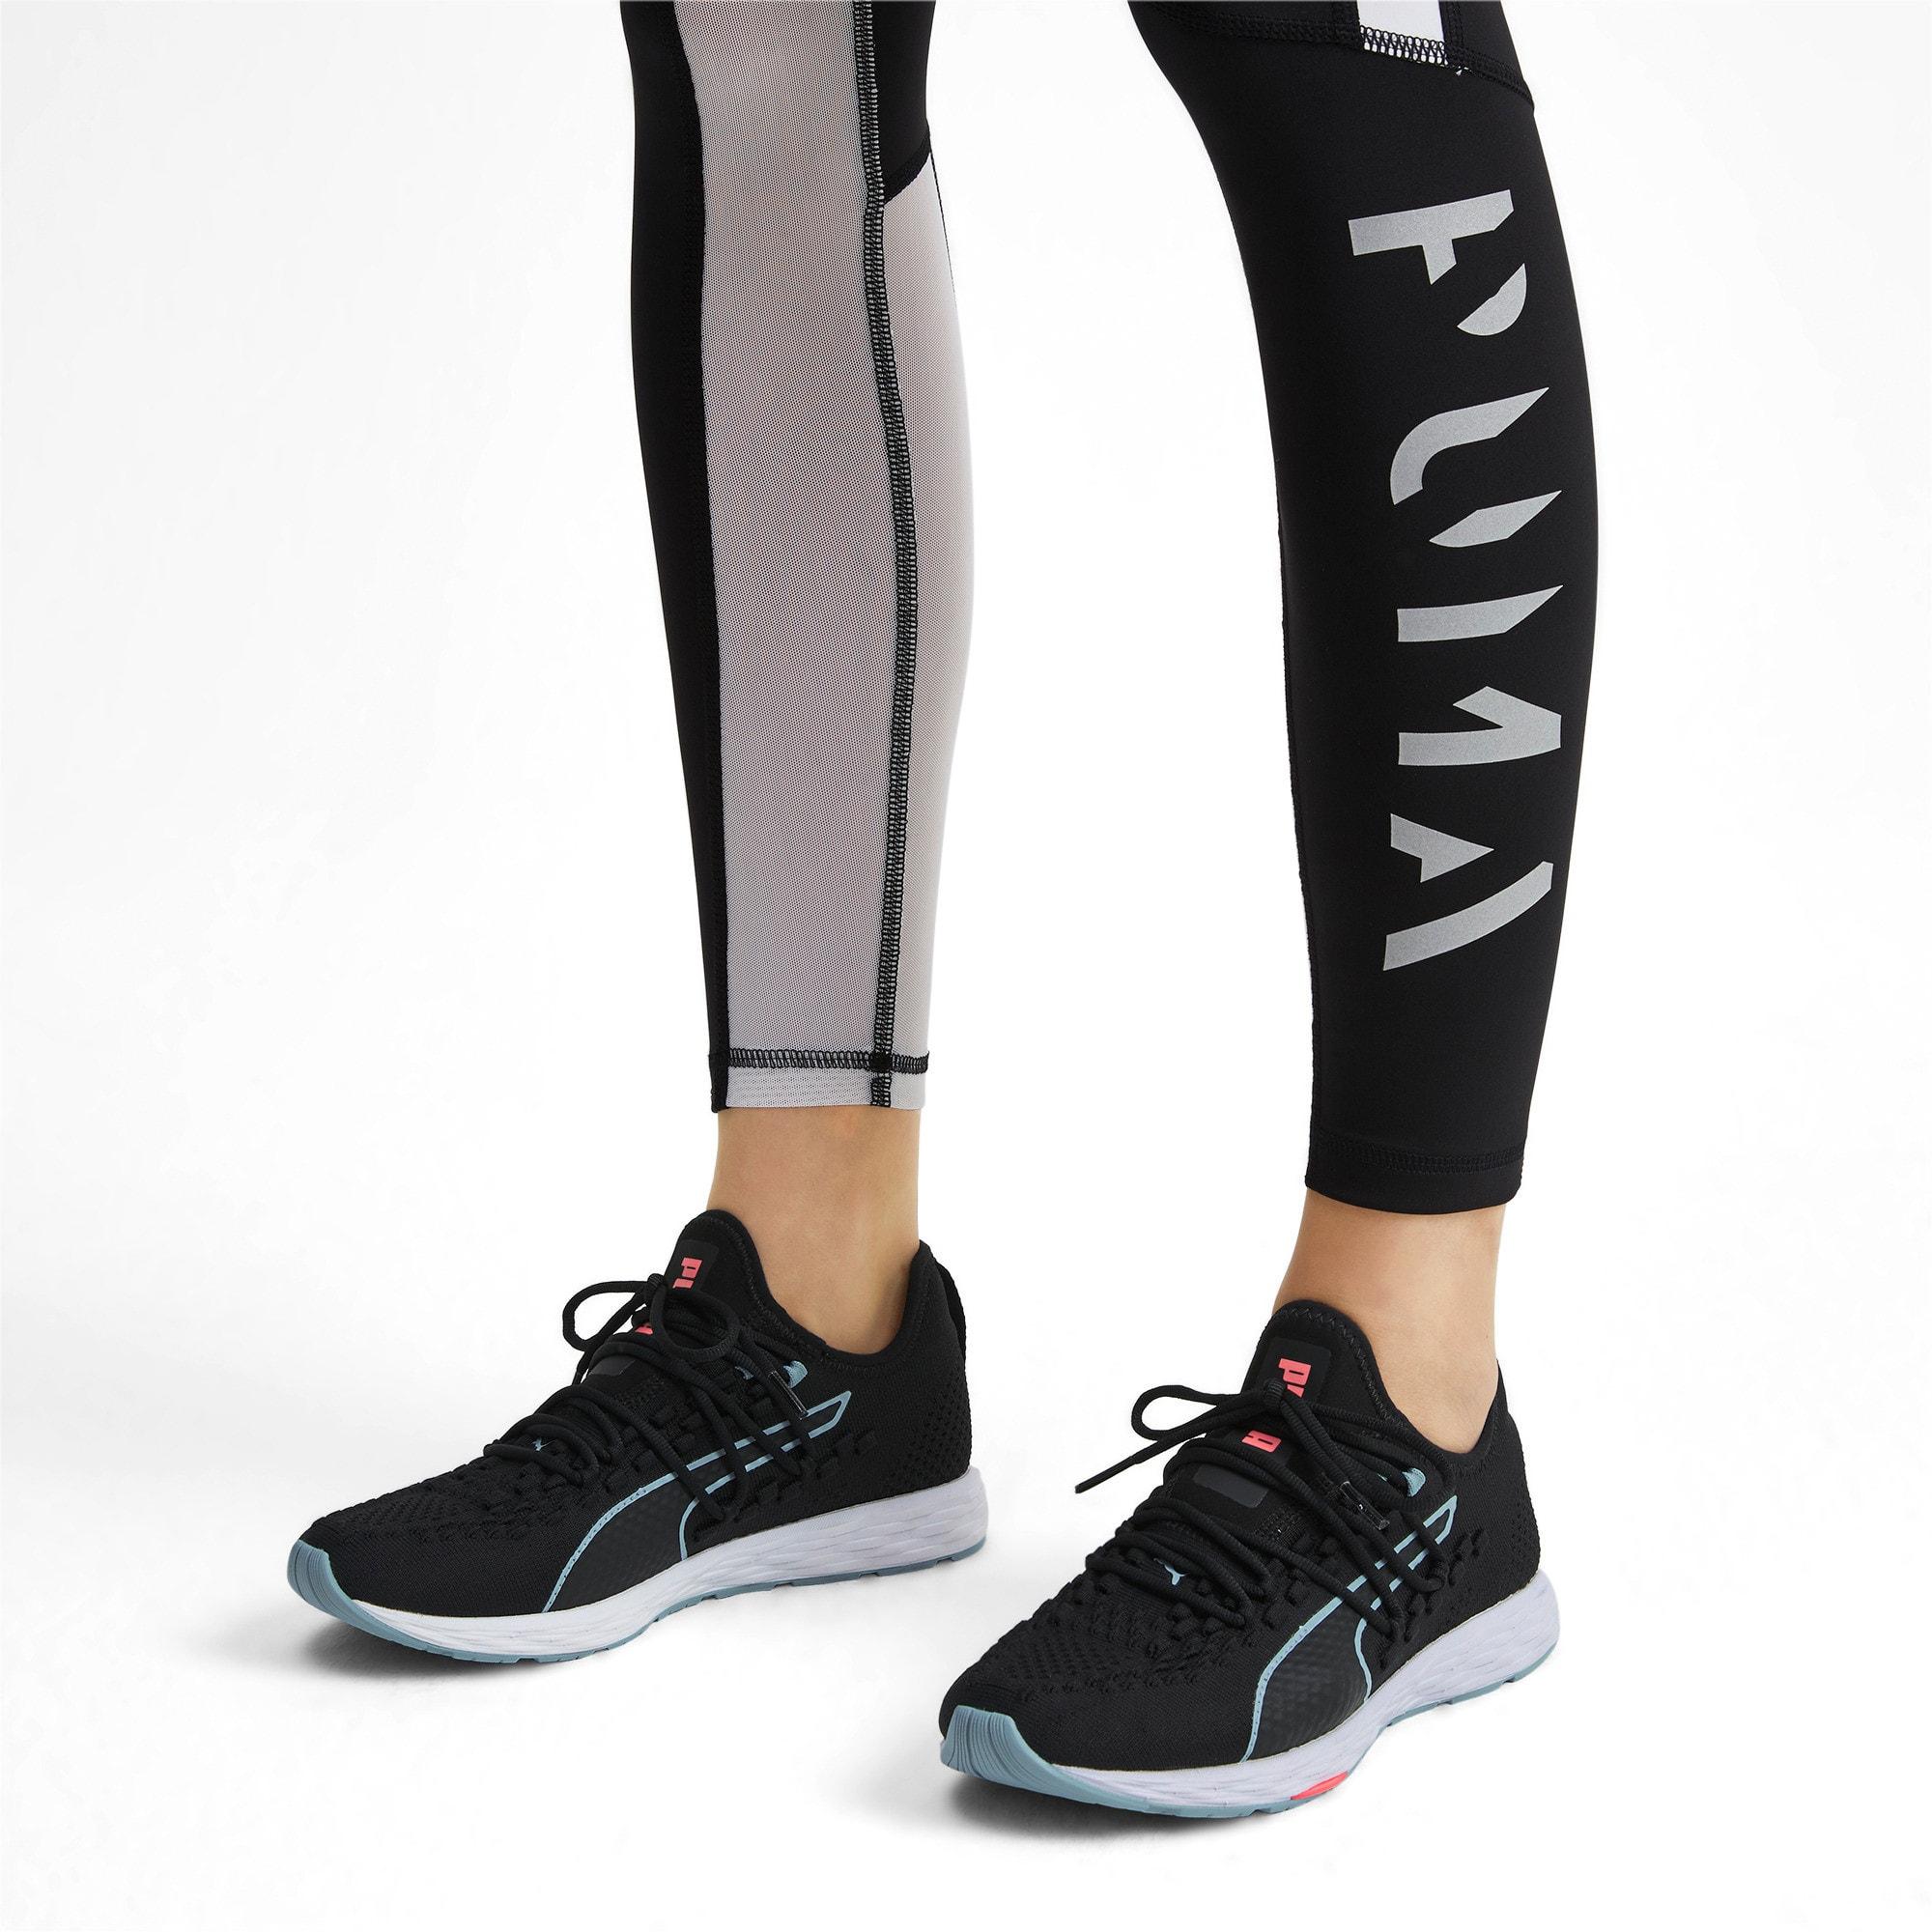 Thumbnail 2 of SPEED RACER Women's Running Shoes, Black-Milky Blue-Pink Alert, medium